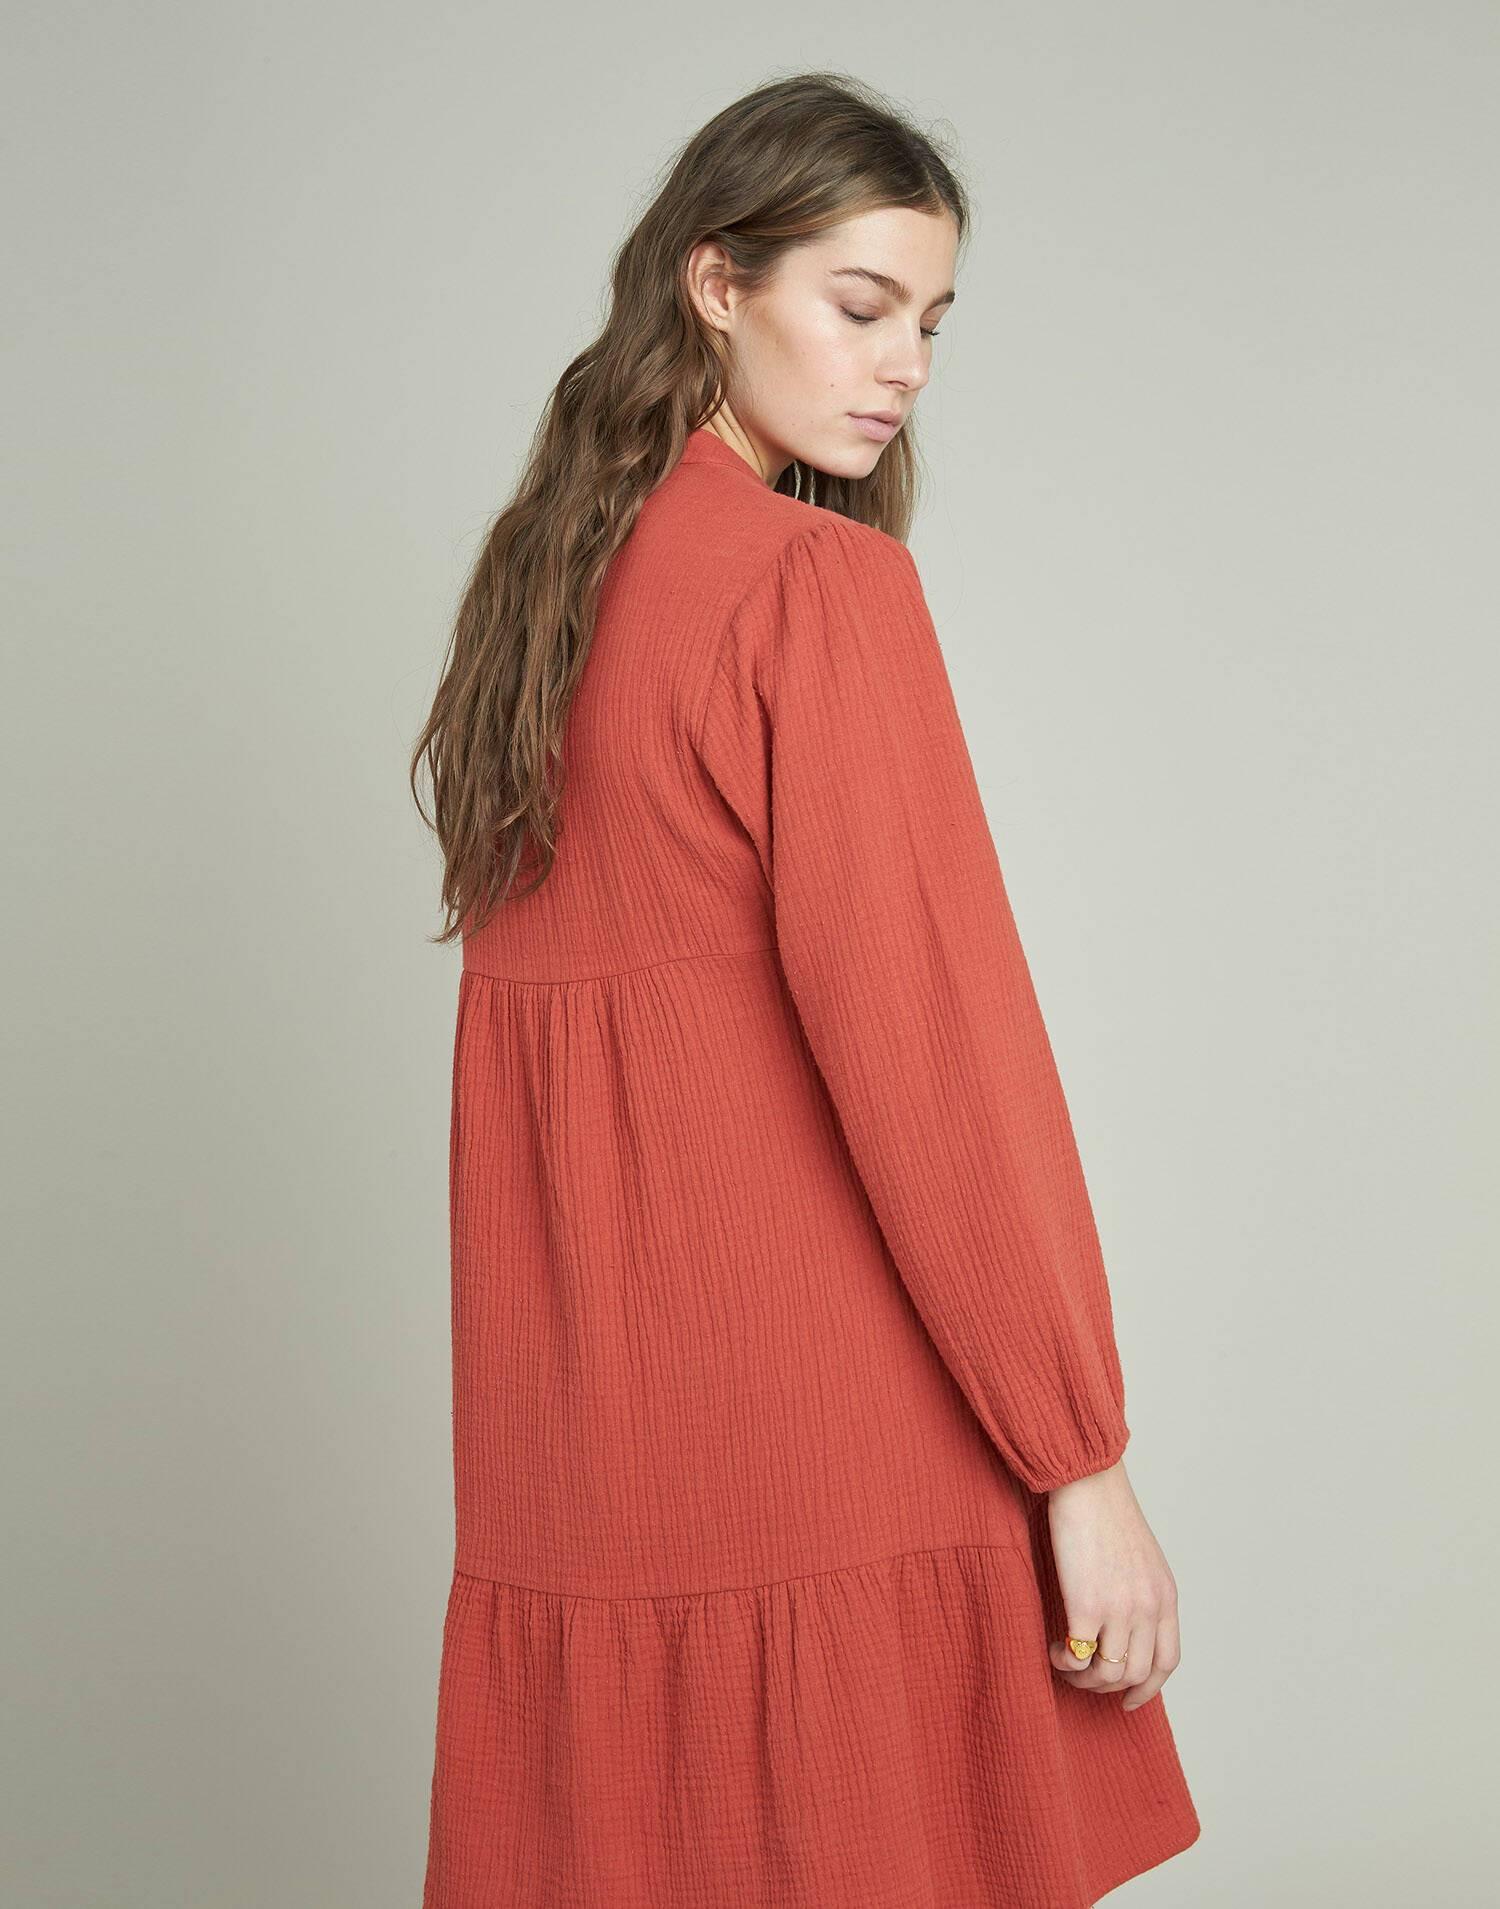 Cotton short dress